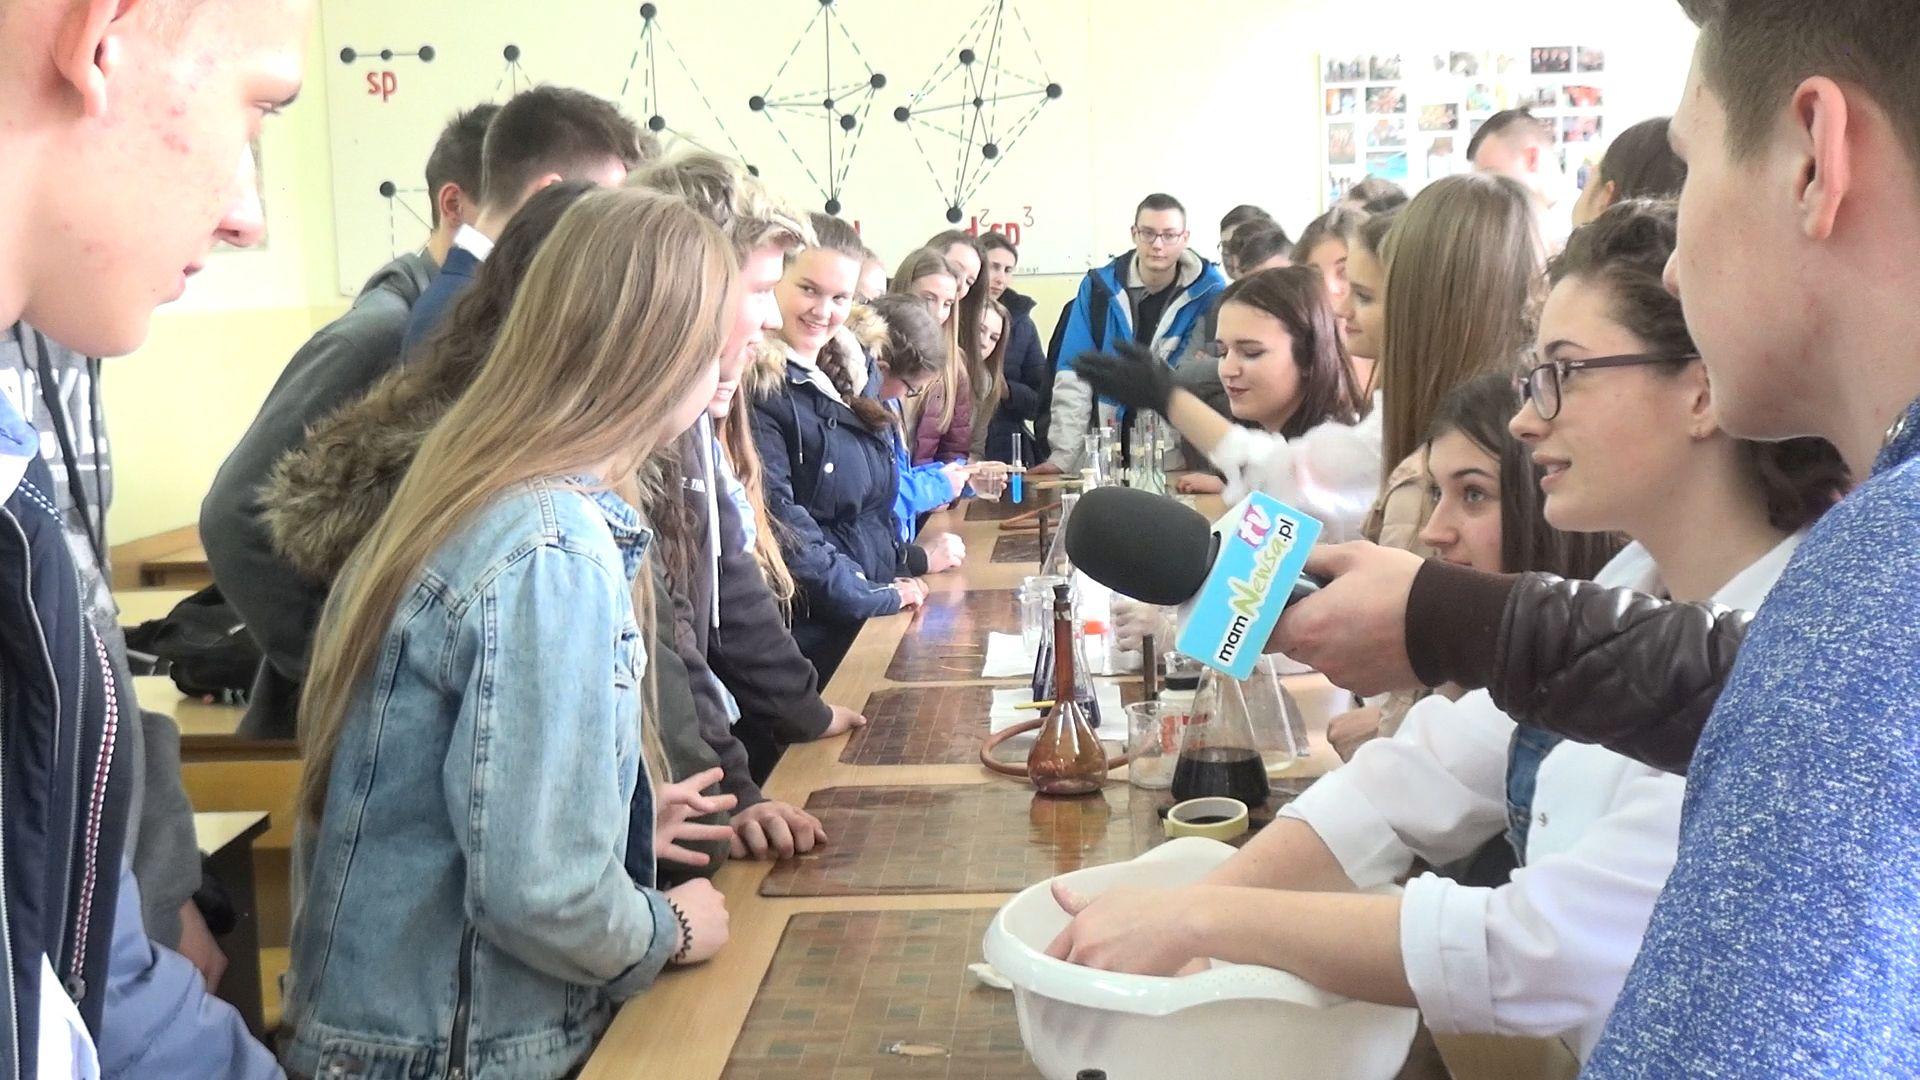 Dni otwarte w Liceum i Kotarbinie [VIDEO]